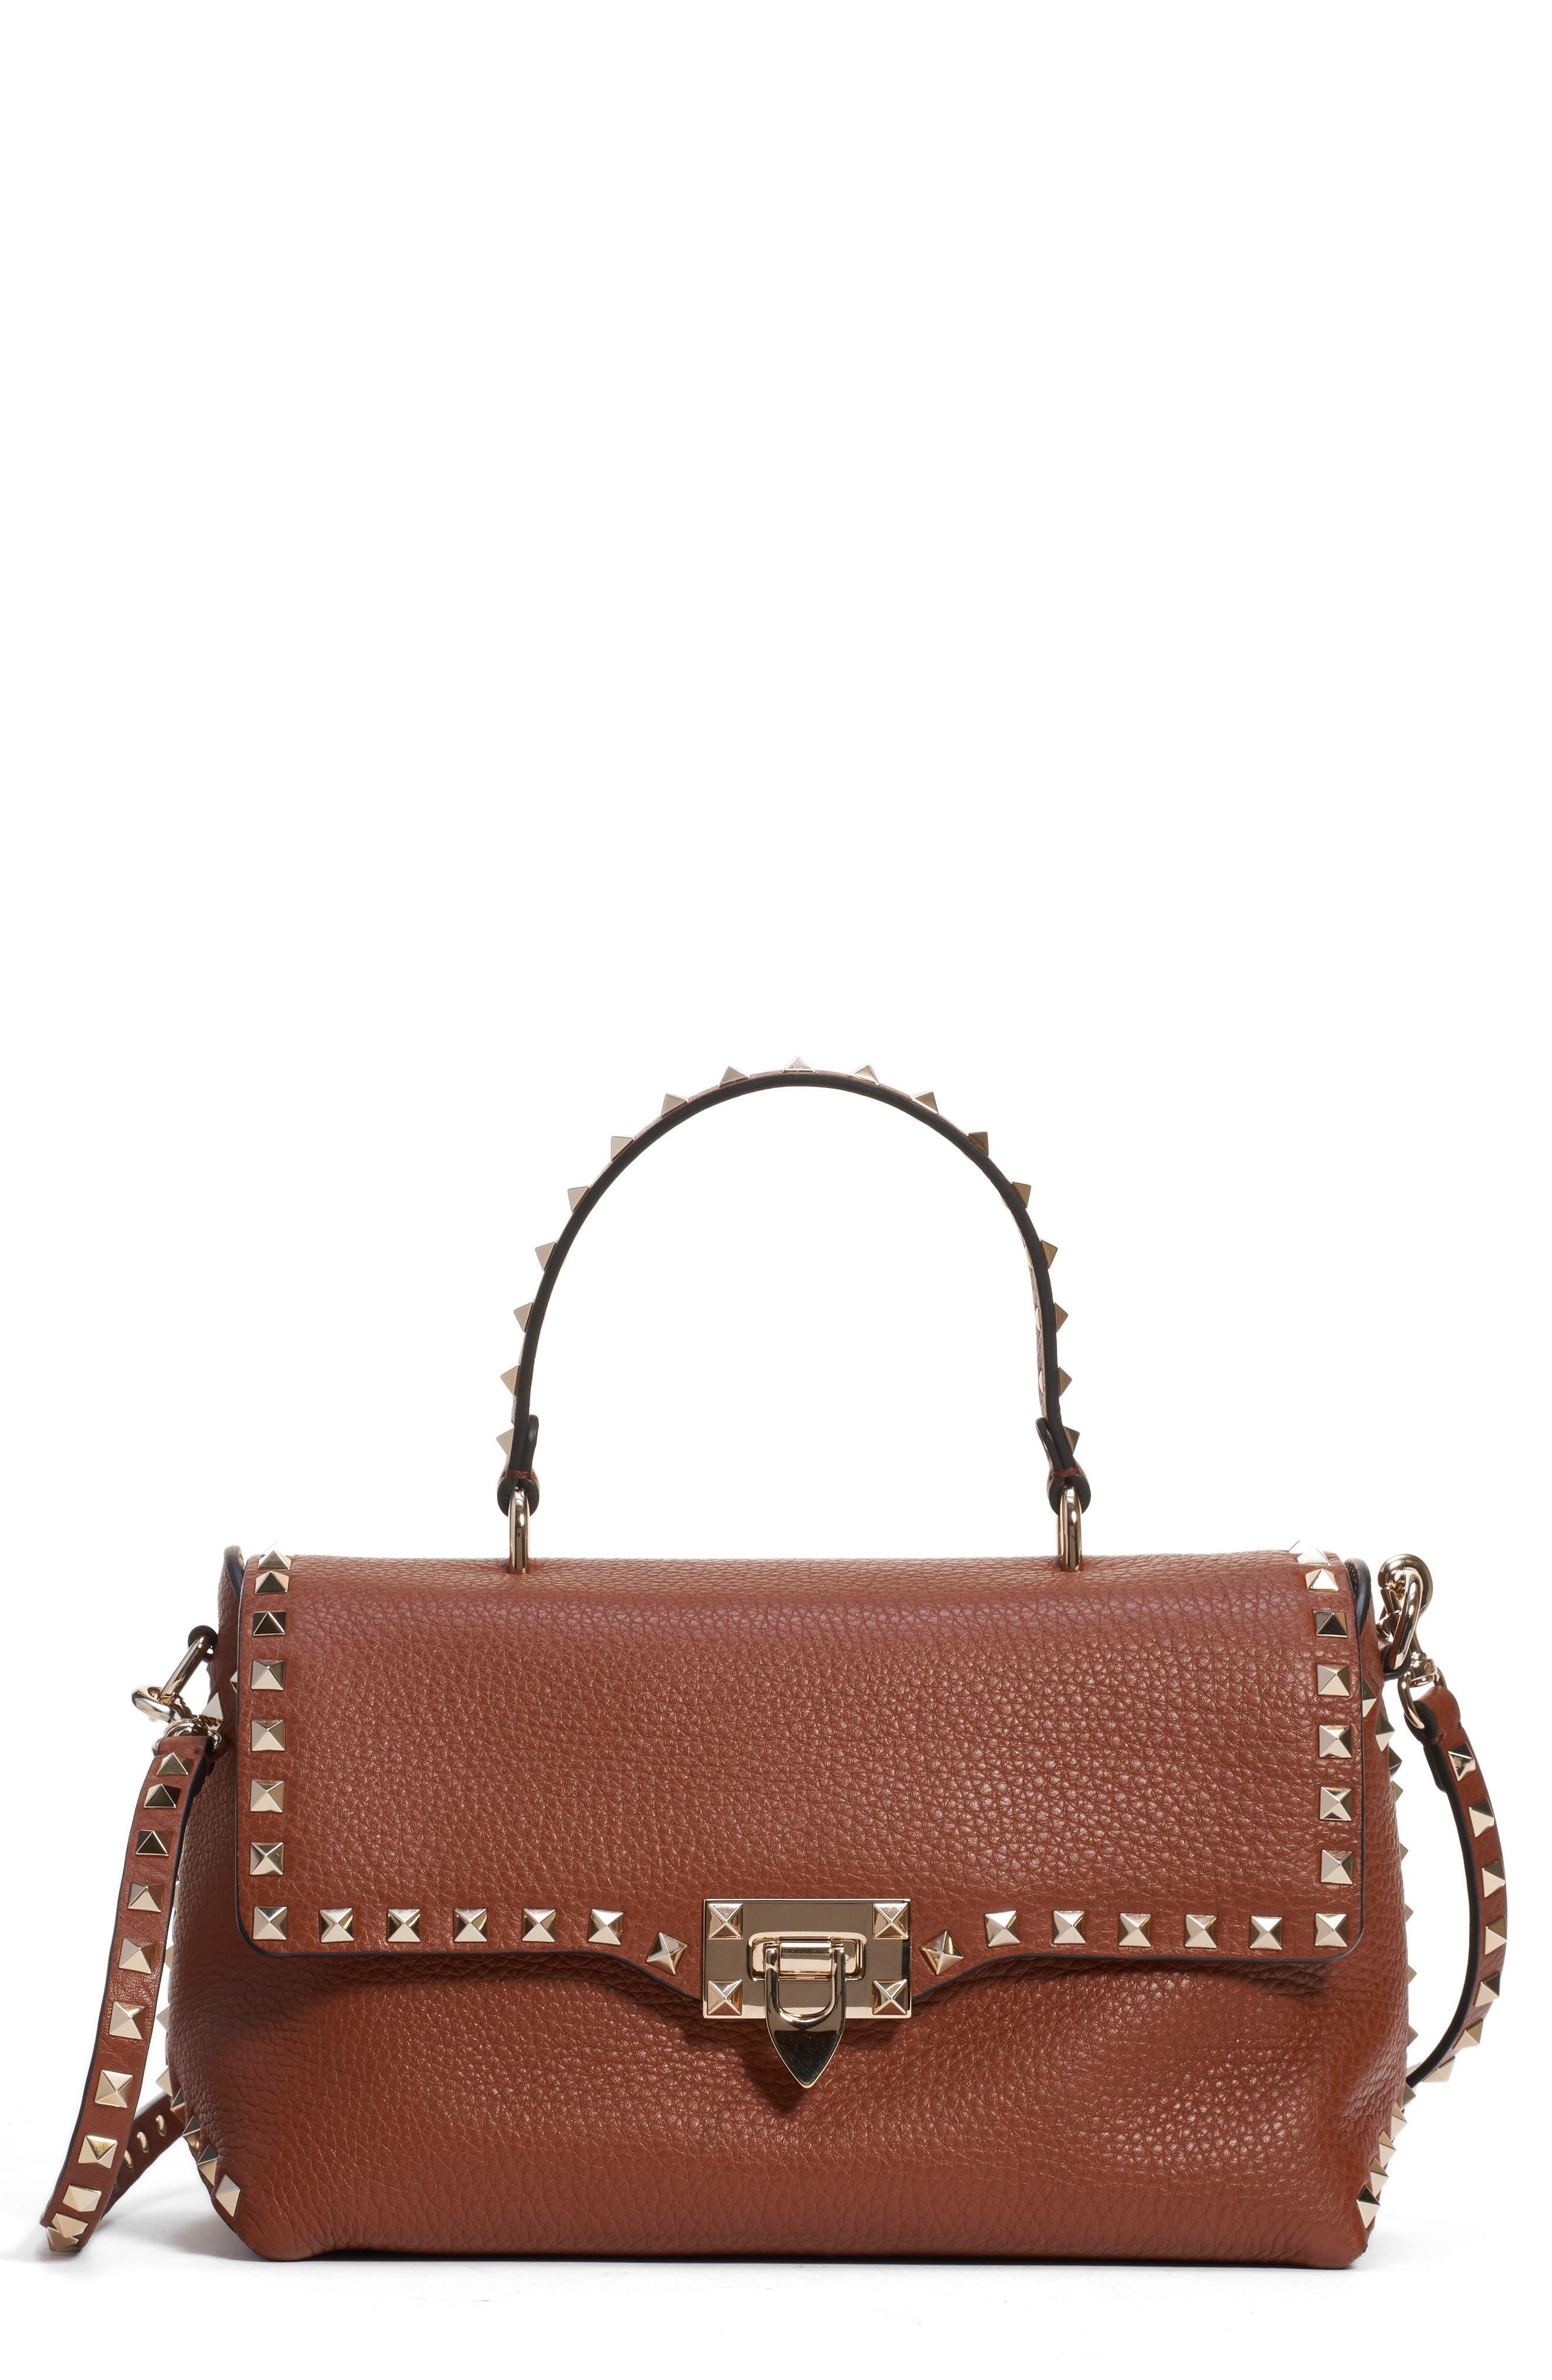 Medium Rockstud Leather Crossbody Bag,                             Main thumbnail 1, color,                             BRIGHT COGNAC